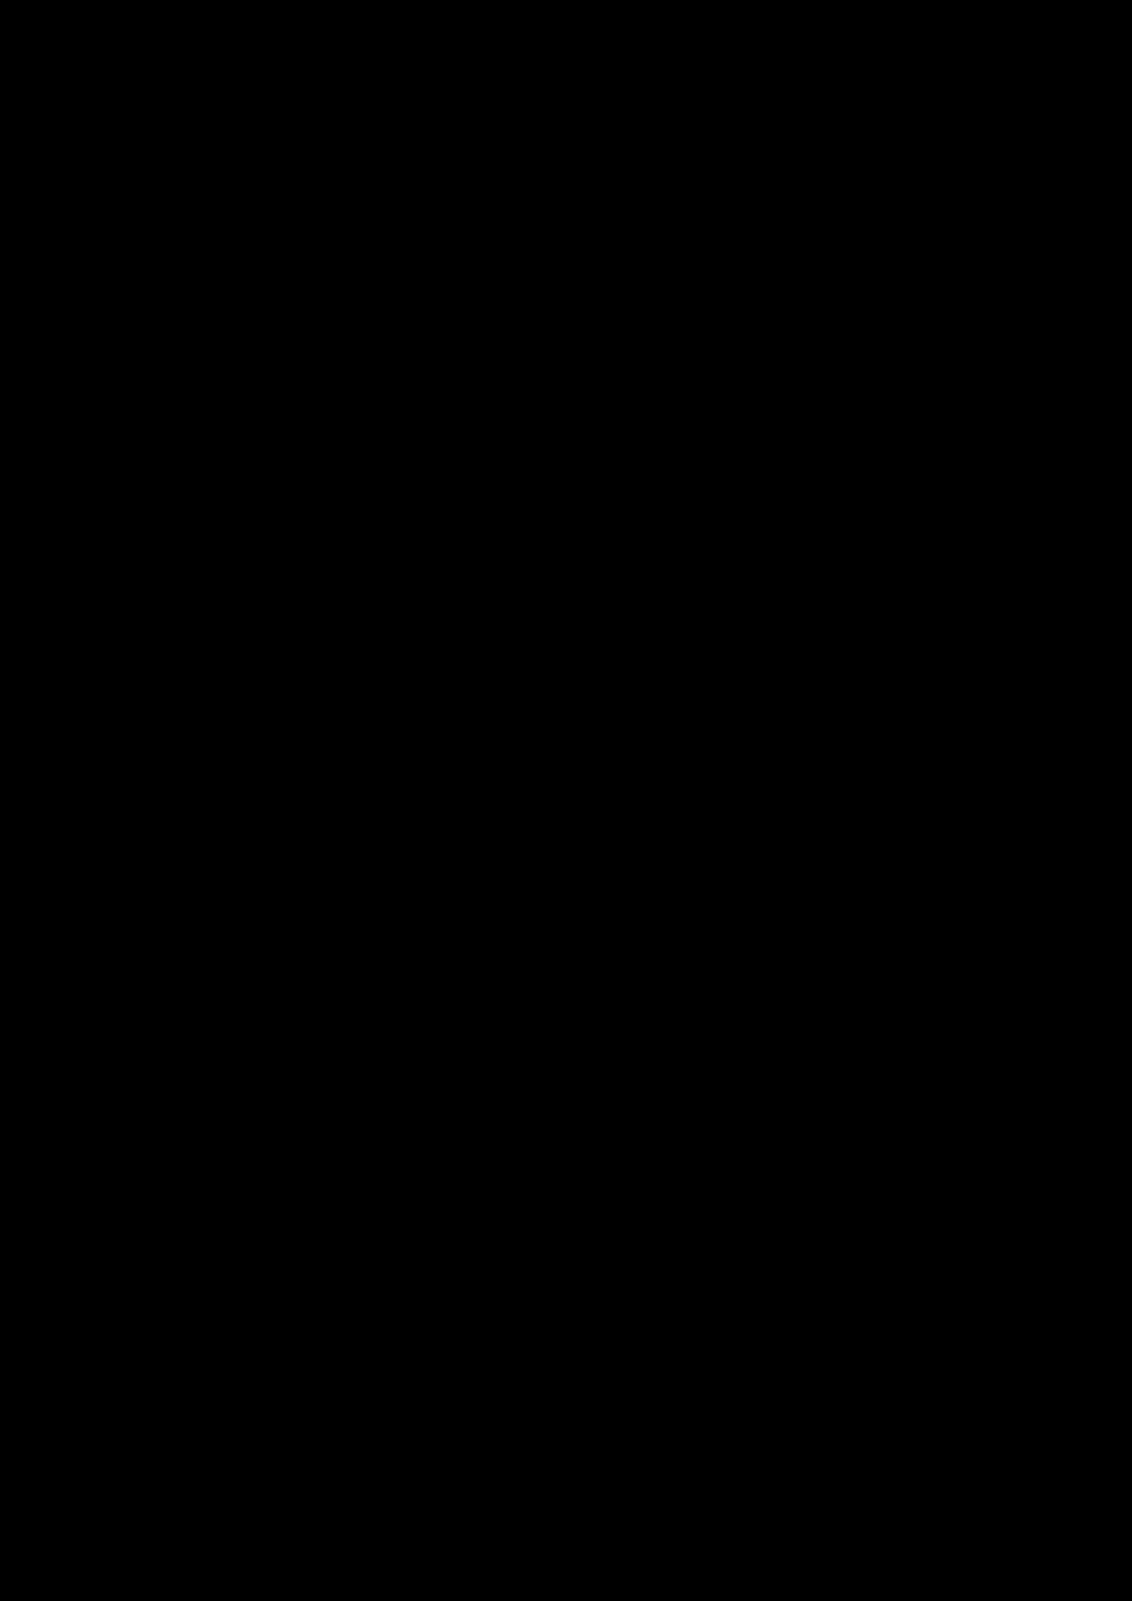 Belyiy sokol slide, Image 47